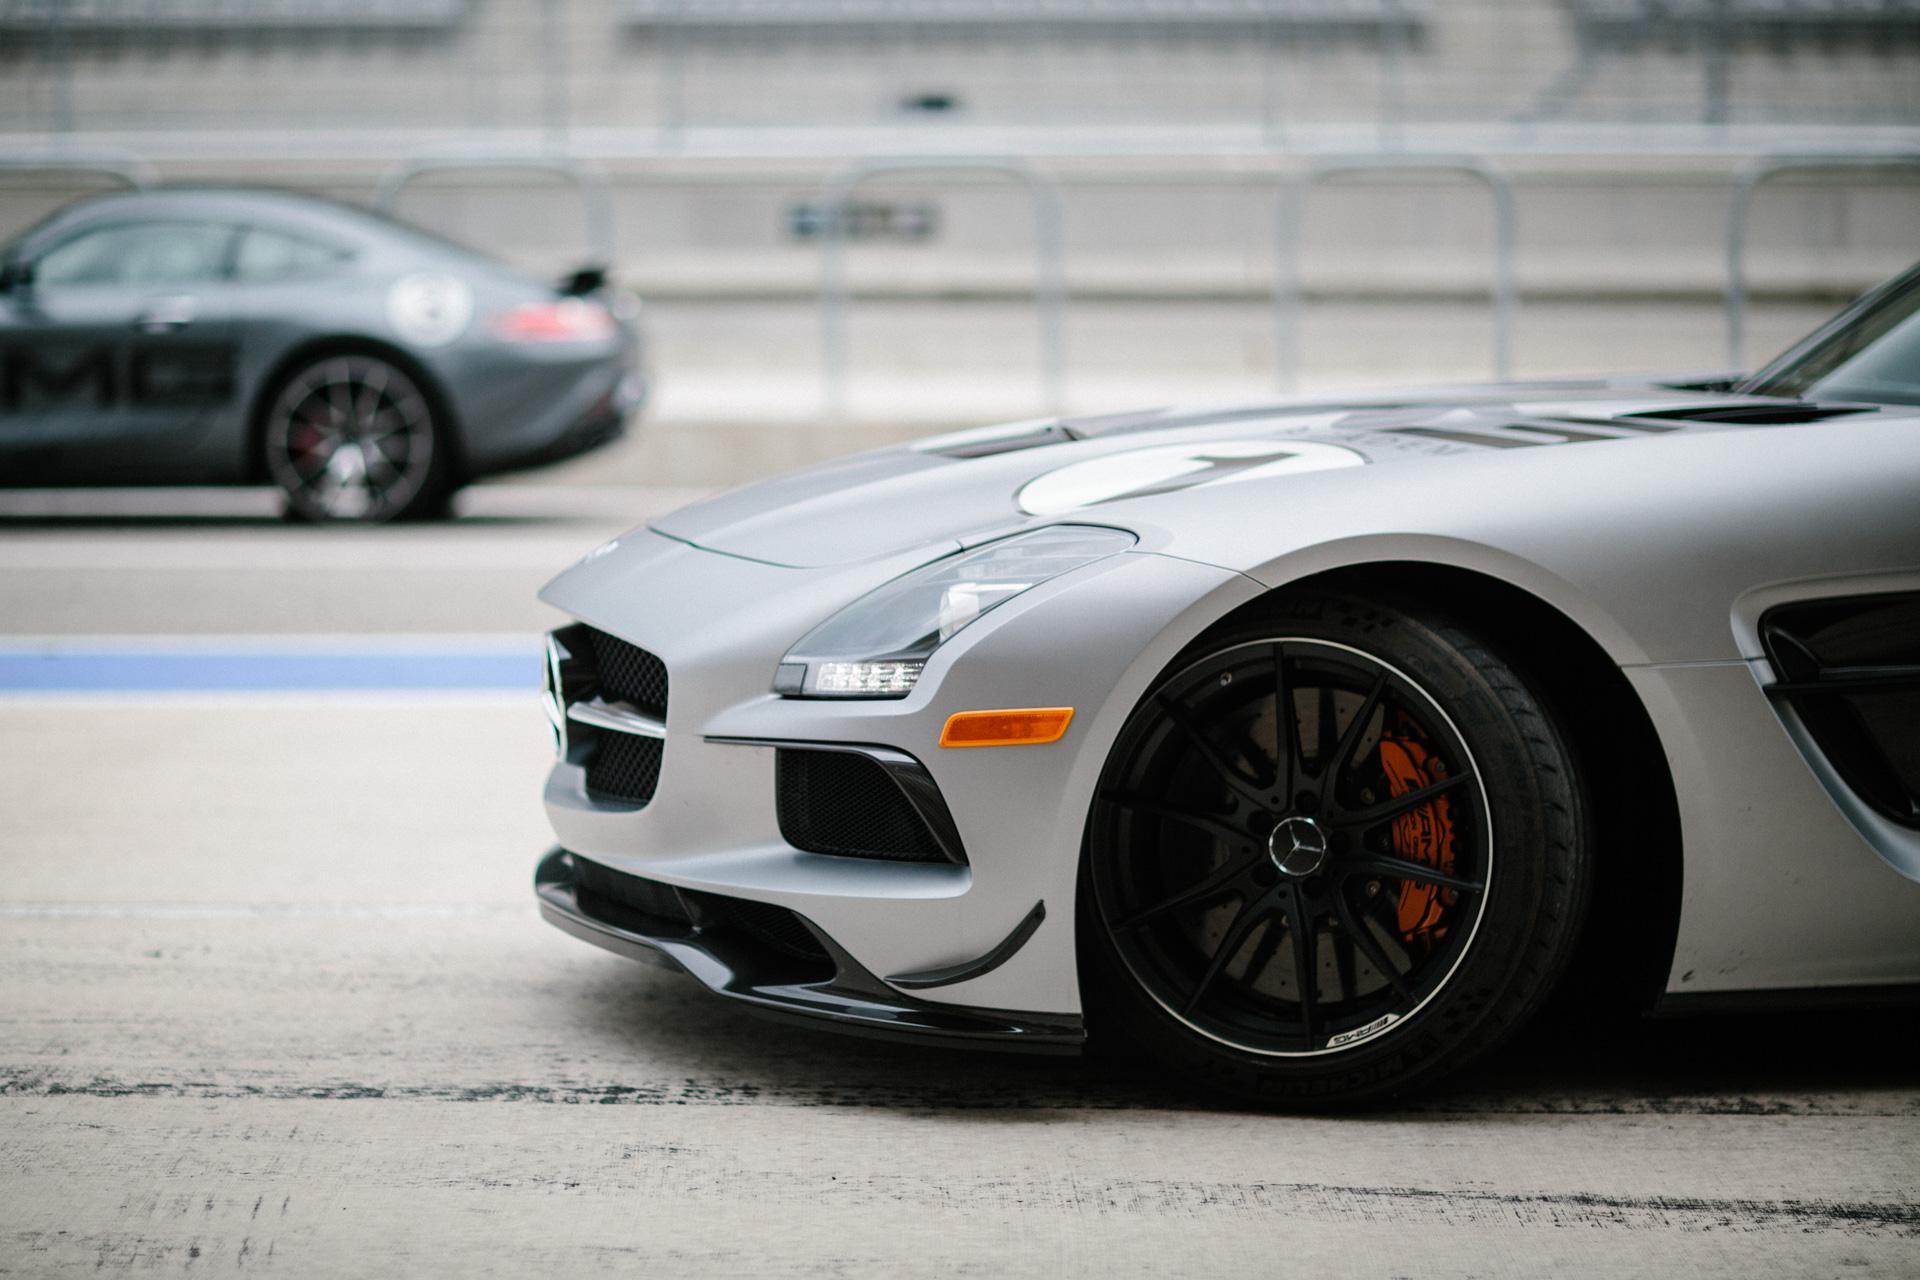 Mercedes_Benz_AMG_2017_Edits (21 of 23).jpg